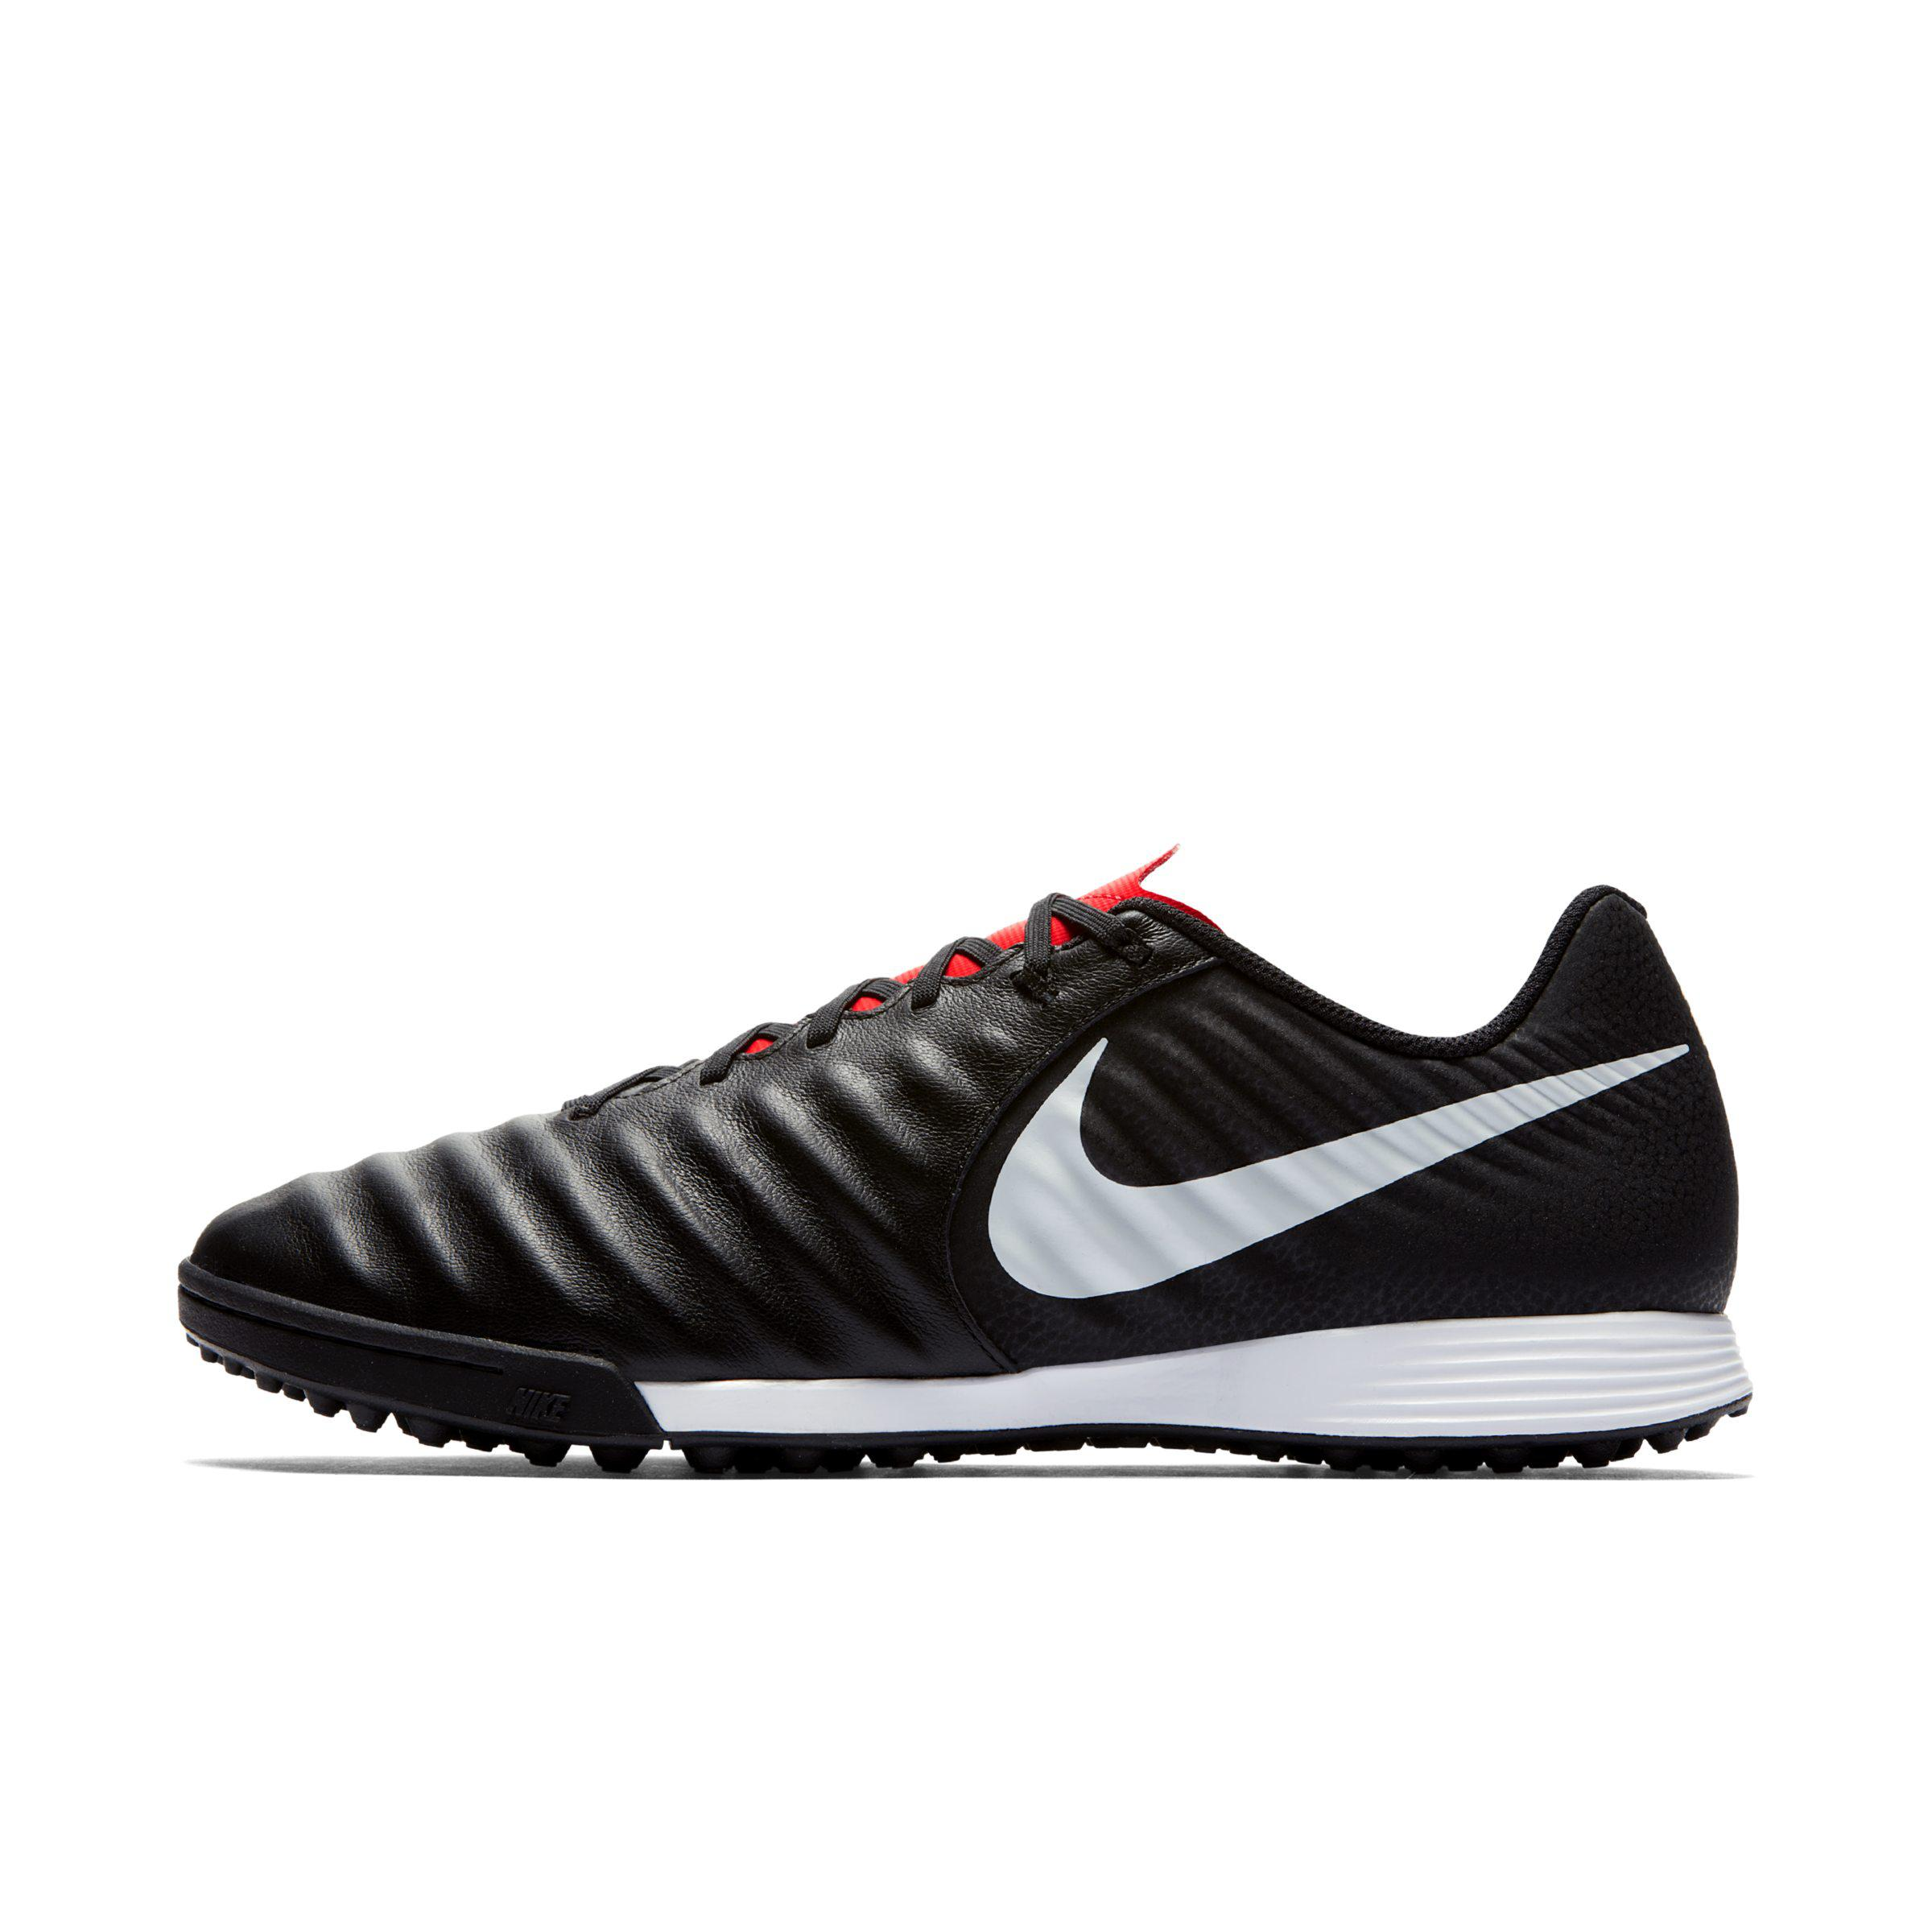 26b68c386 Nike Tiempox Legend Vii Academy Turf Football Boot in Black - Lyst